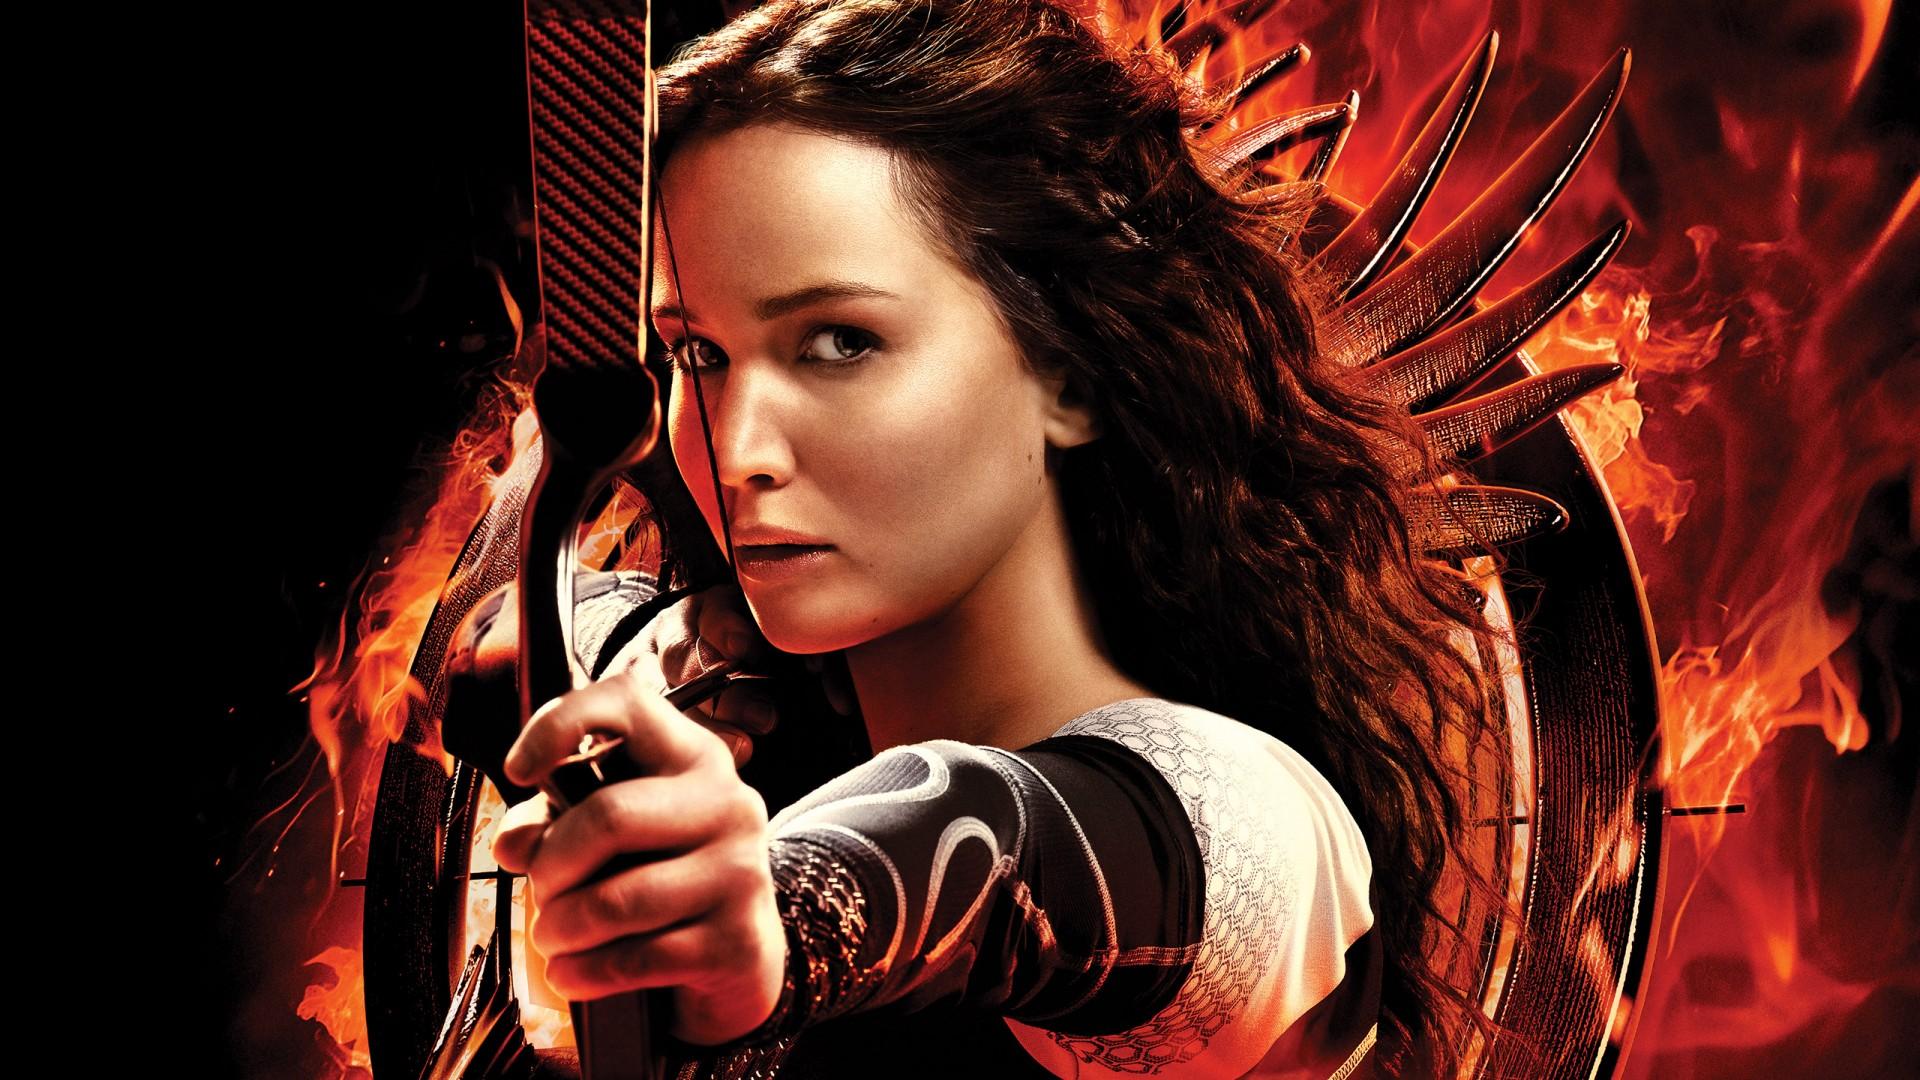 Katniss Jennifer Lawrence Wallpaper   Wallpaper Stream 1920x1080